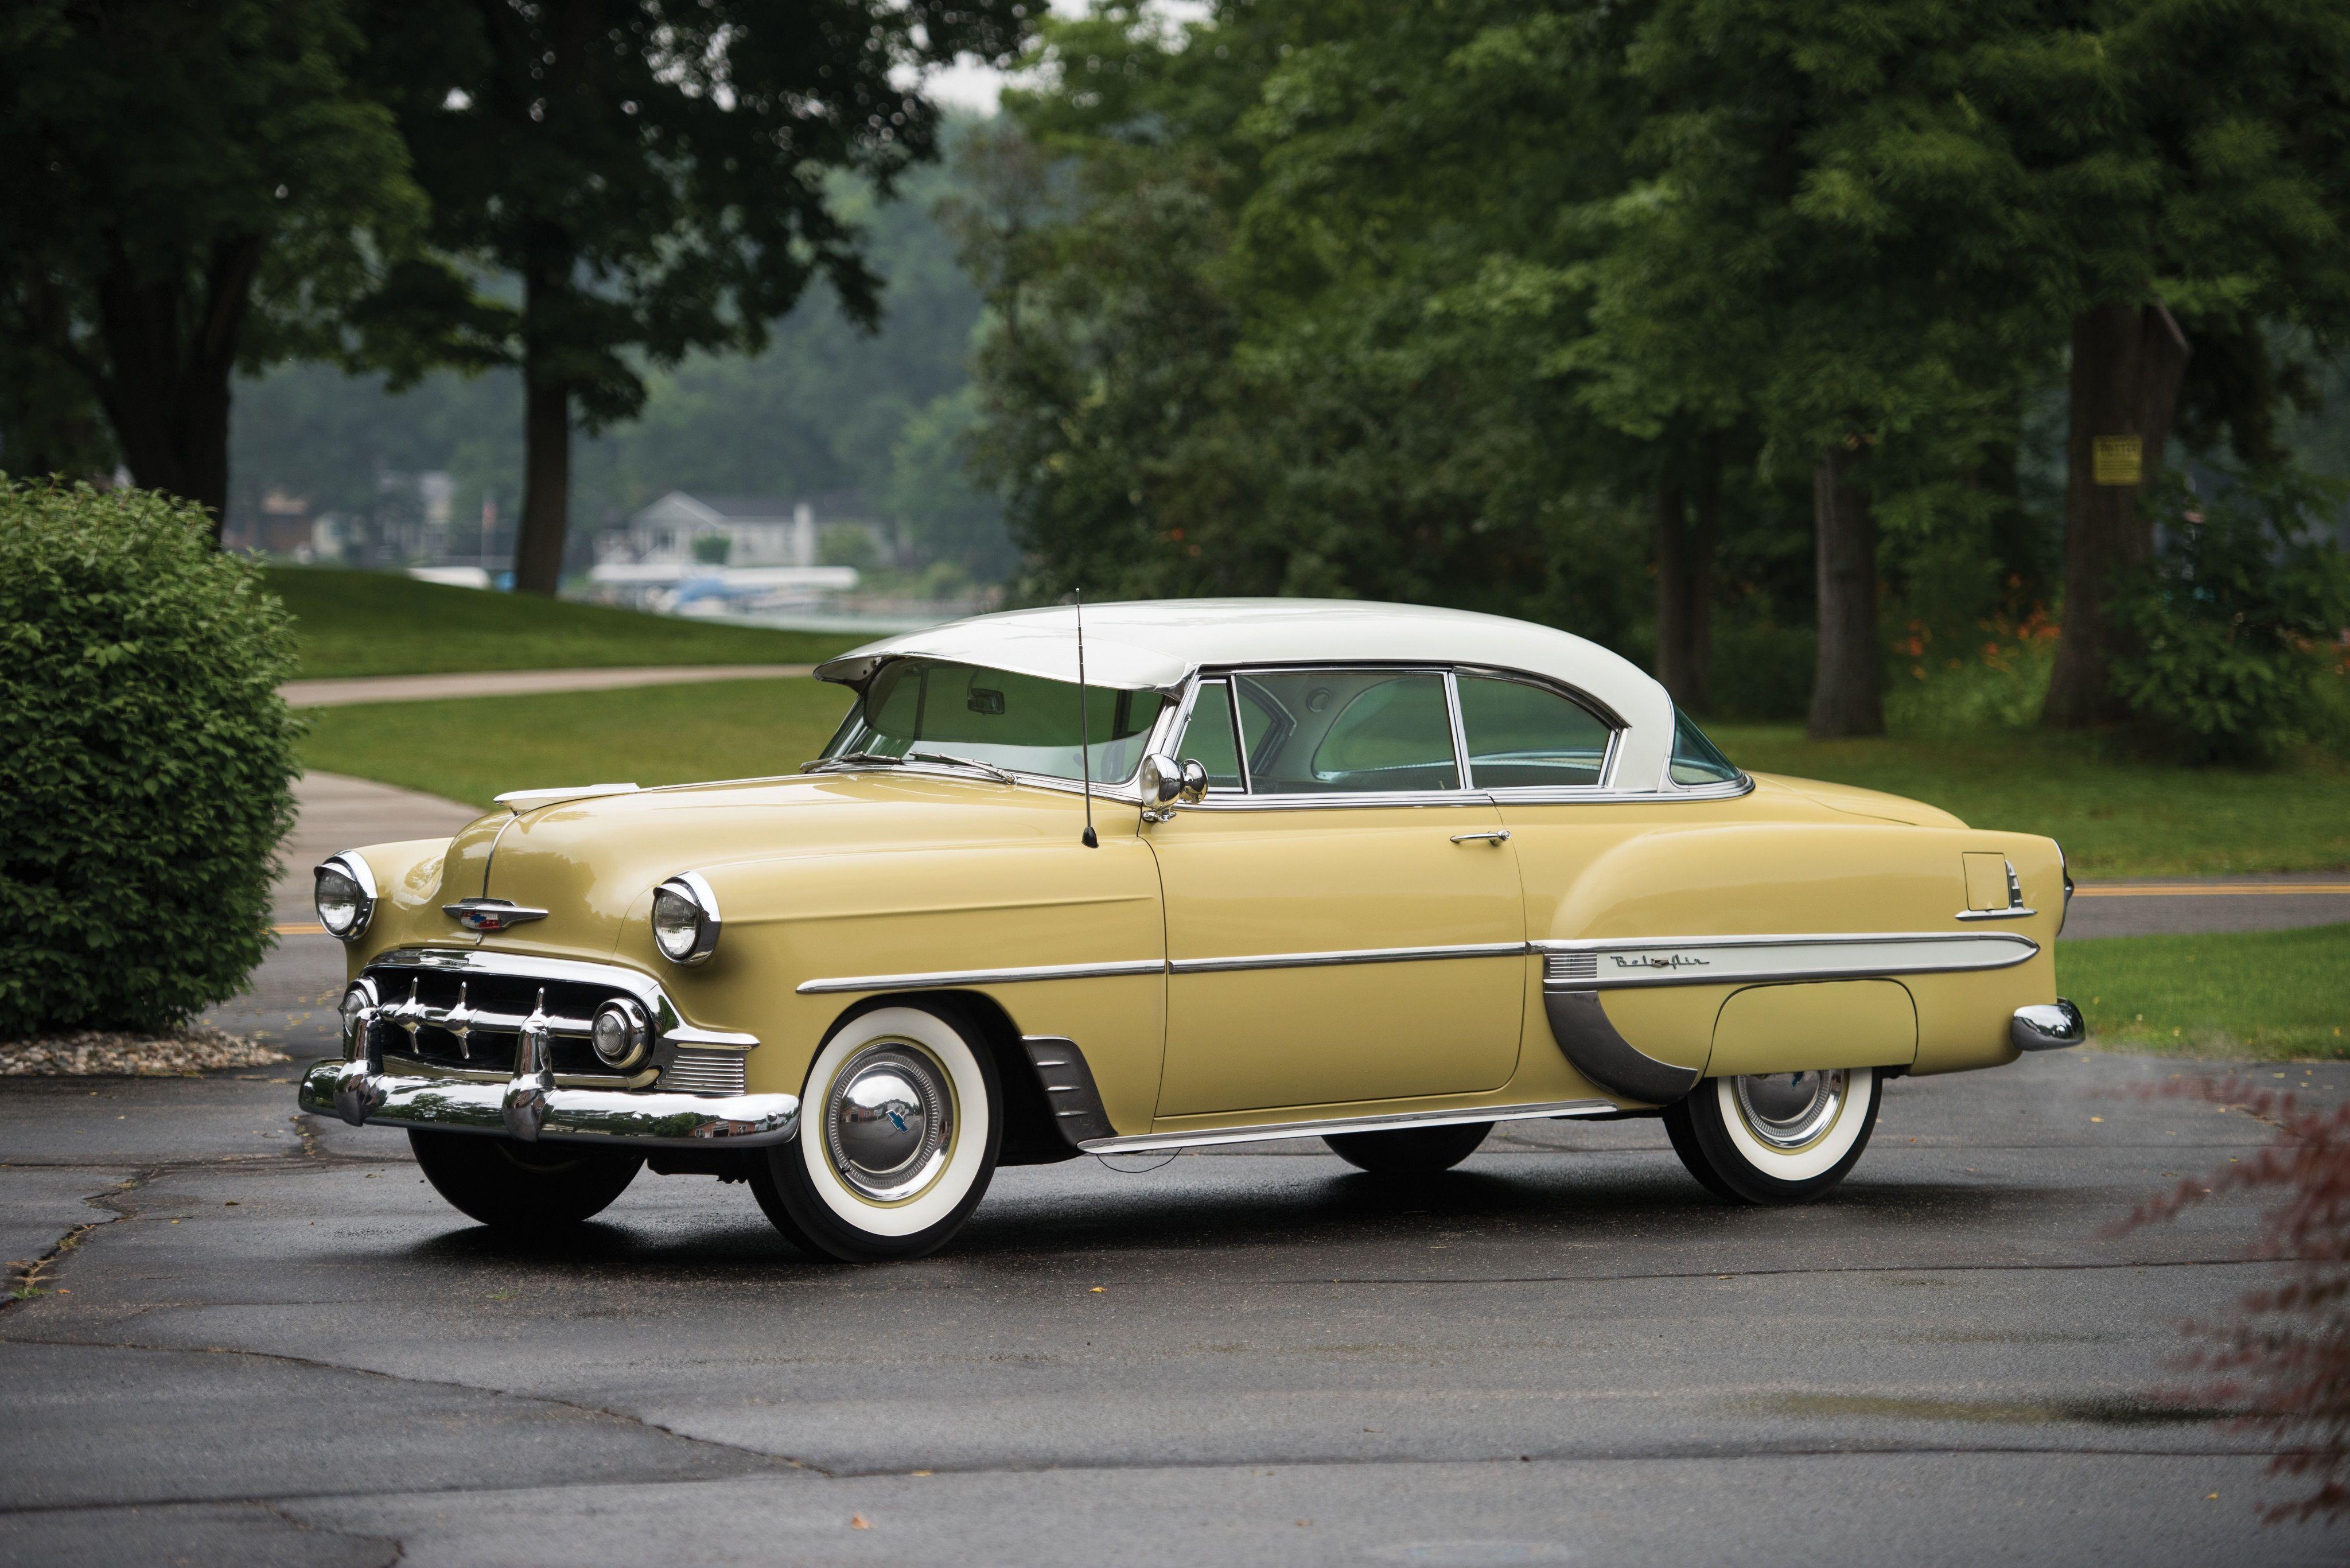 1954 chevrolet 4 door belair cars pinterest chevrolet chevrolet bel air and bel air